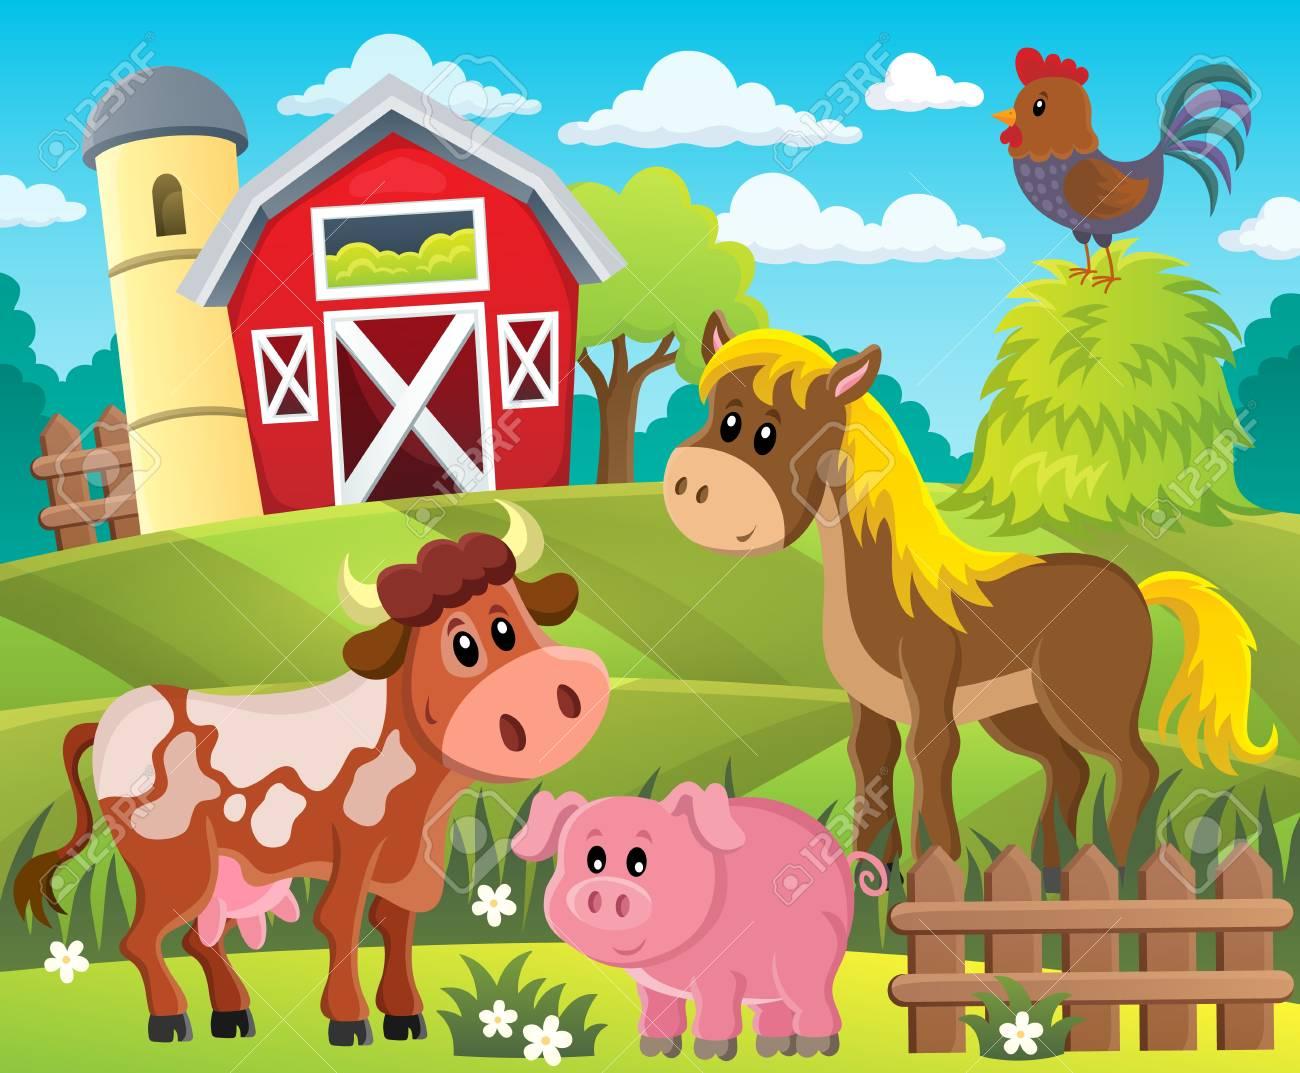 Farmland with animals theme 1 - eps10 vector illustration. - 74631169